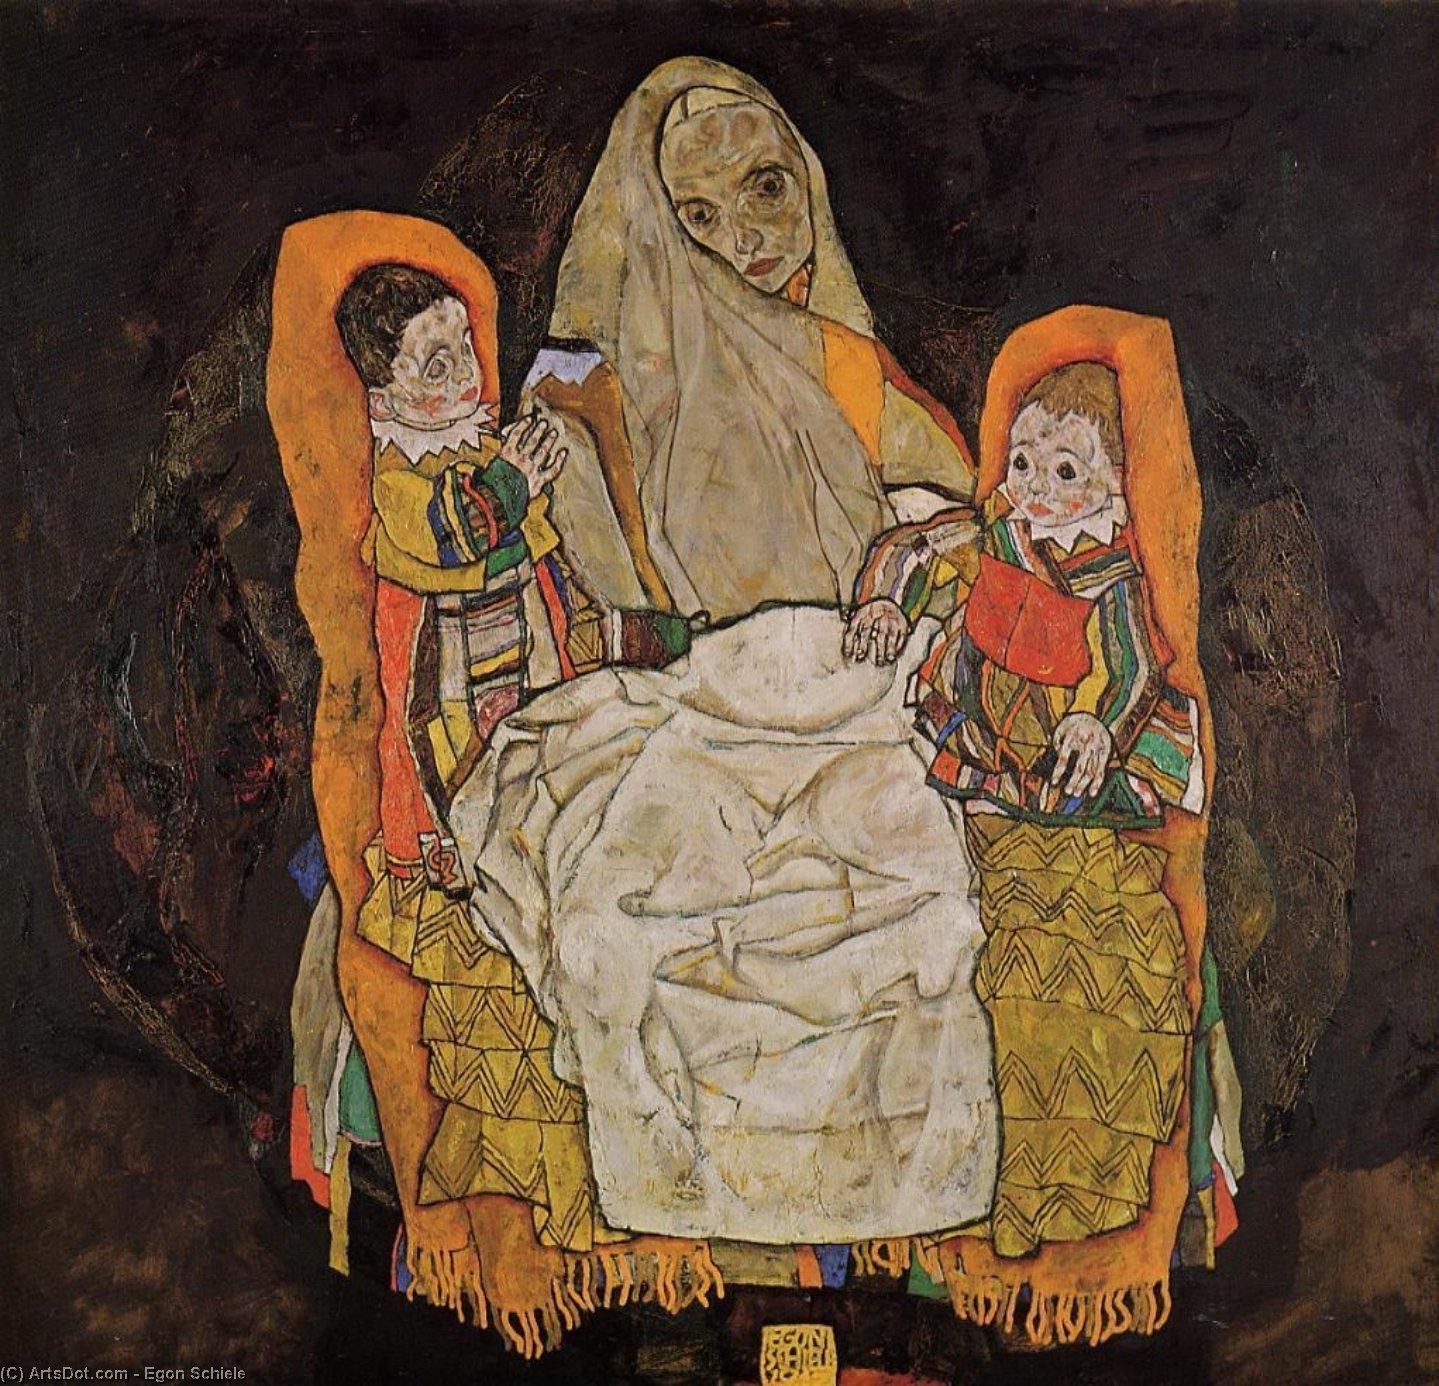 Wikoo.org - موسوعة الفنون الجميلة - اللوحة، العمل الفني Egon Schiele - Mother with Two Children